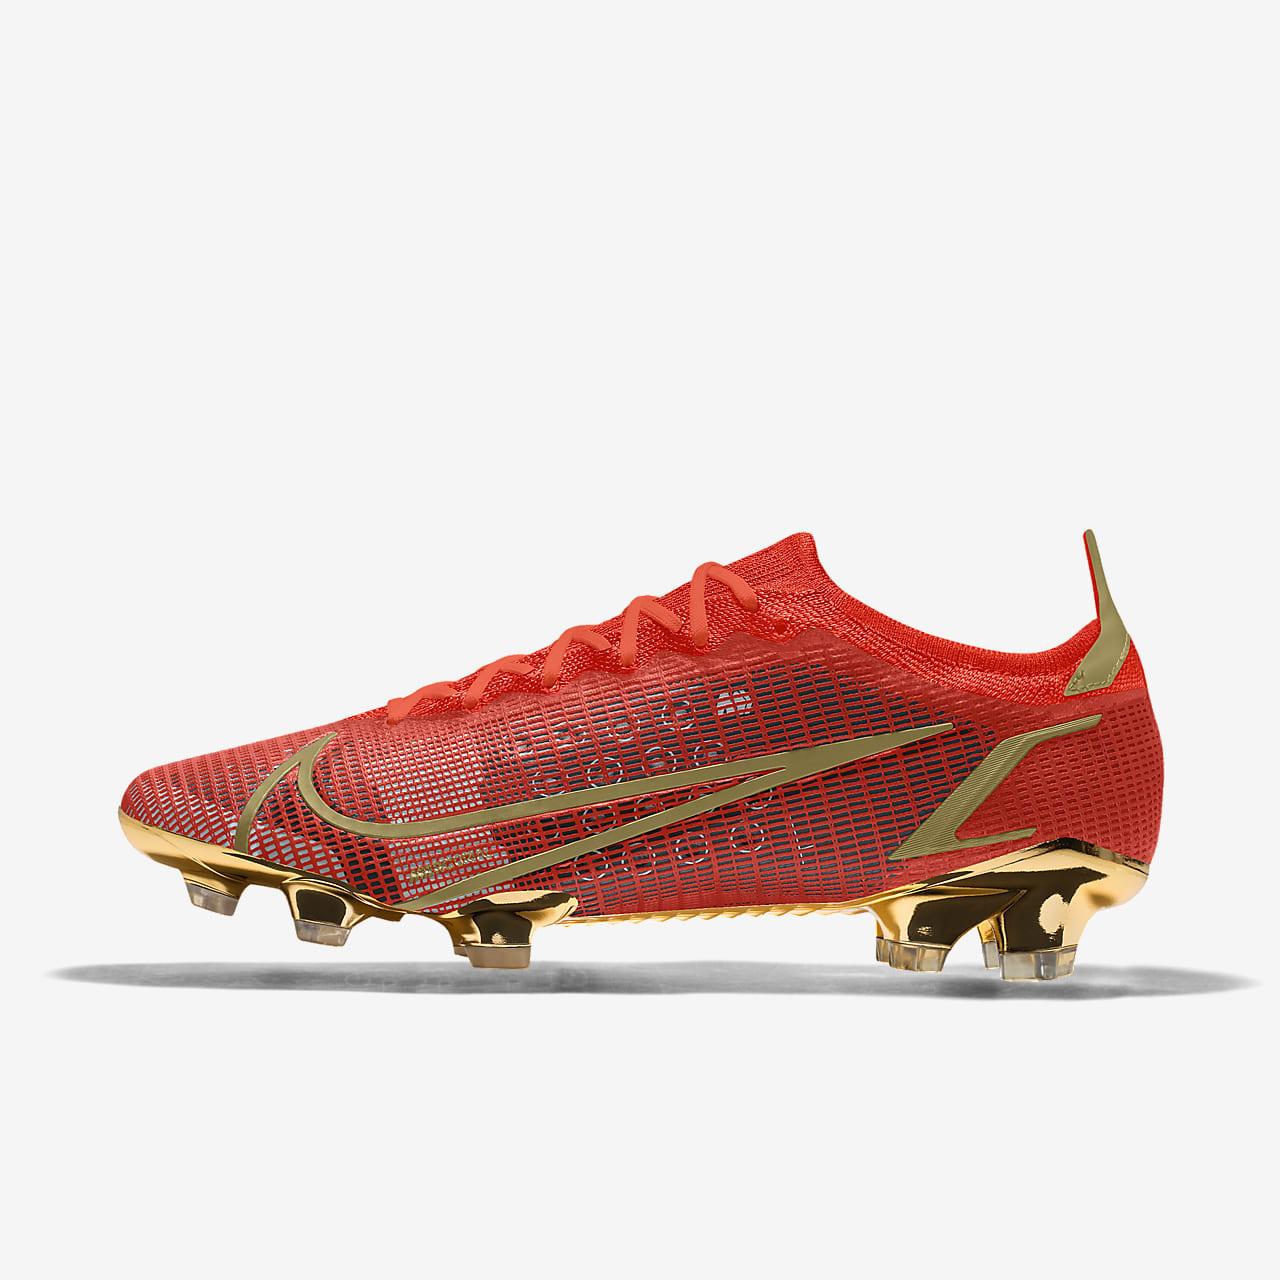 Nike Mercurial Vapor 14 Elite By You Custom Football Boot